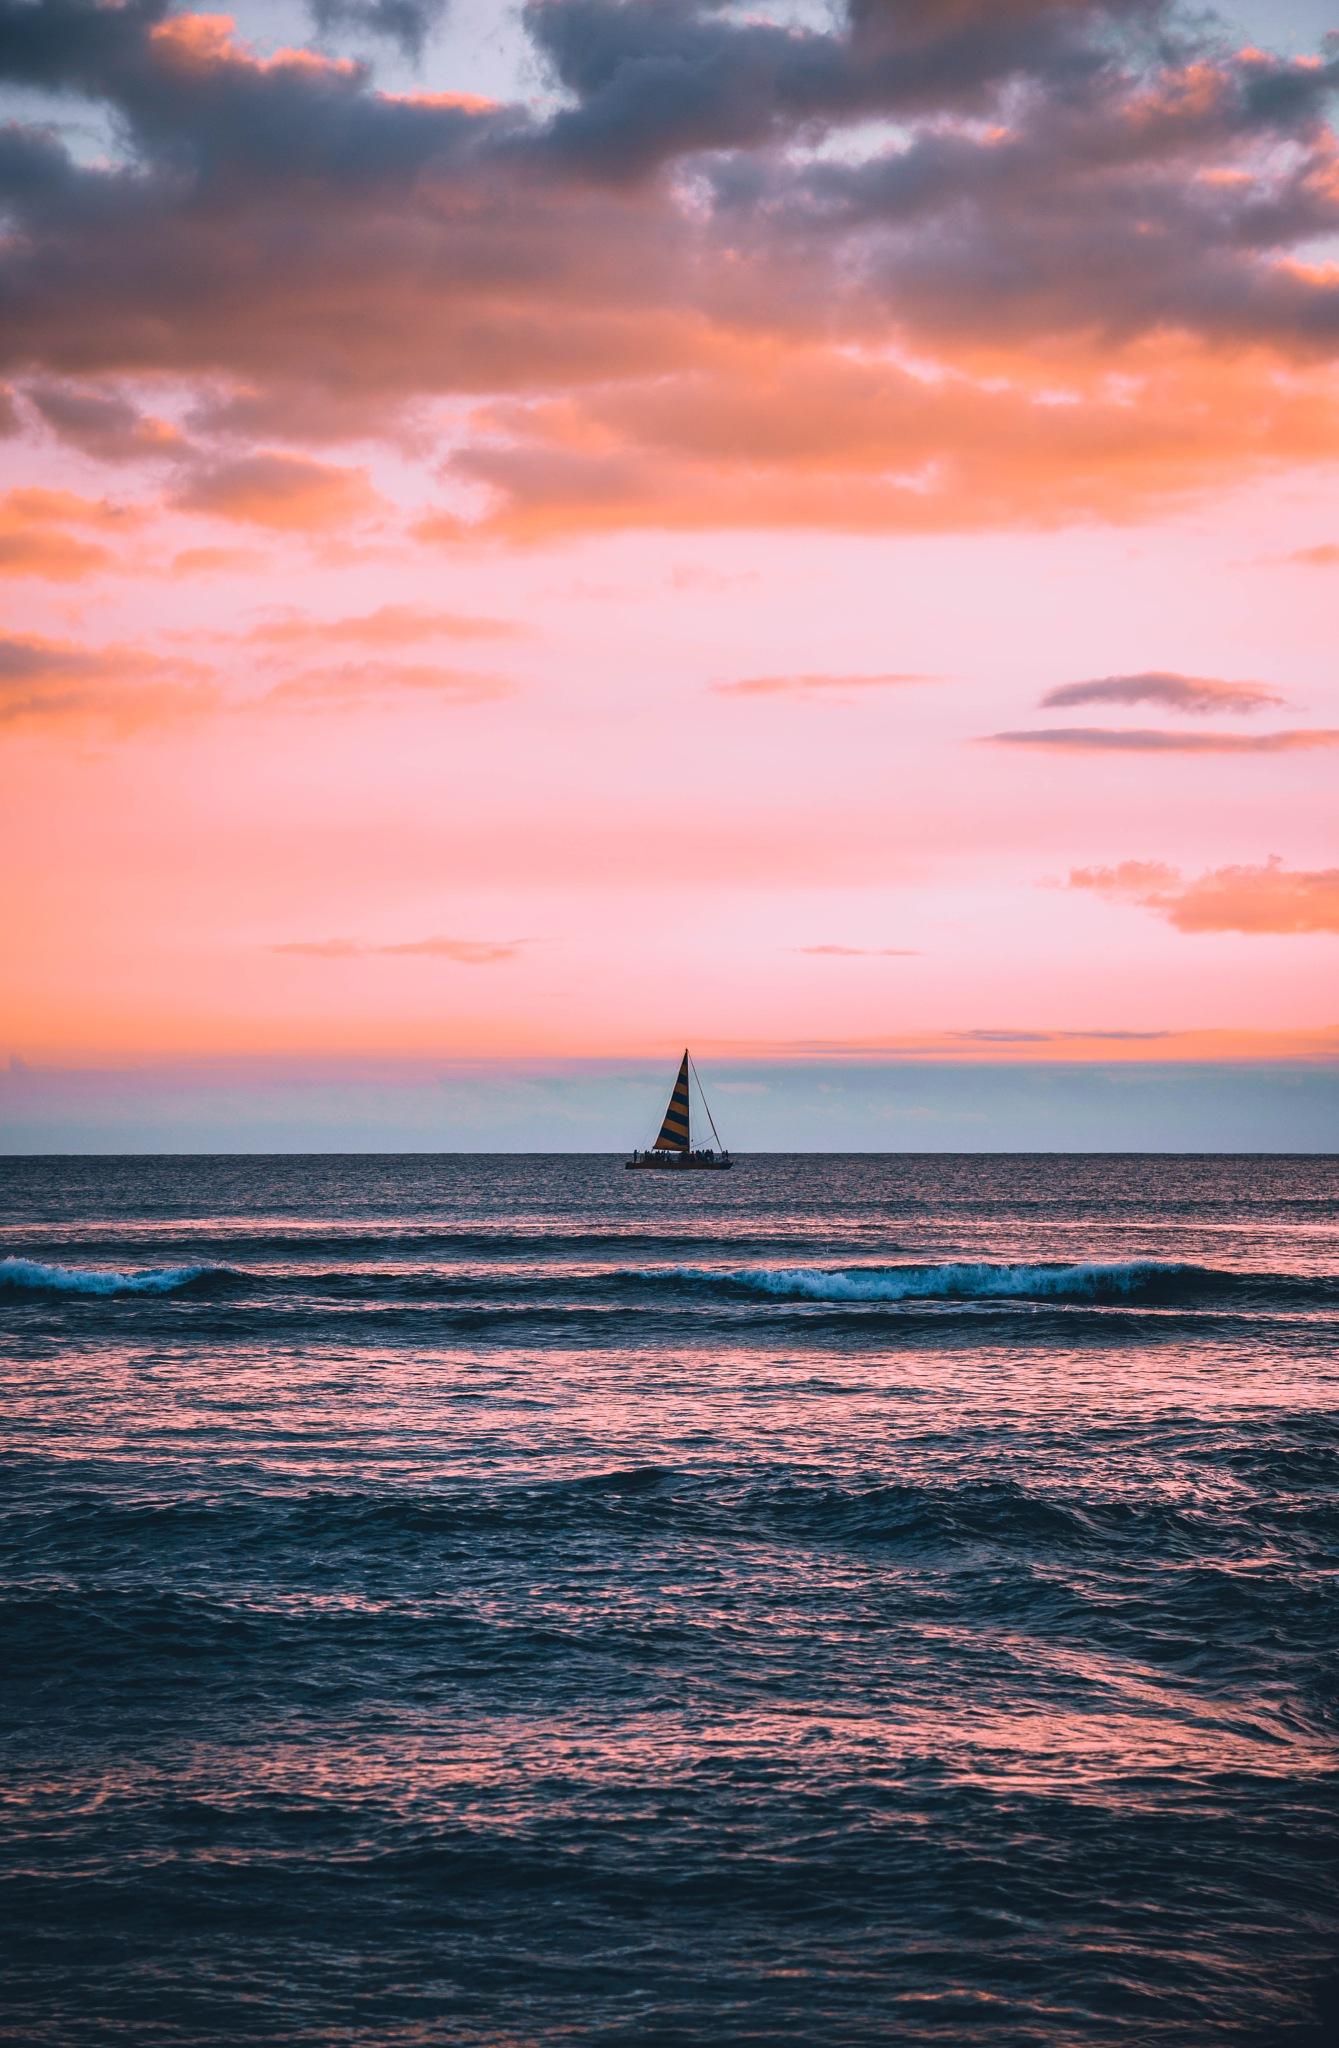 lost at sea by Makana Middlesworth